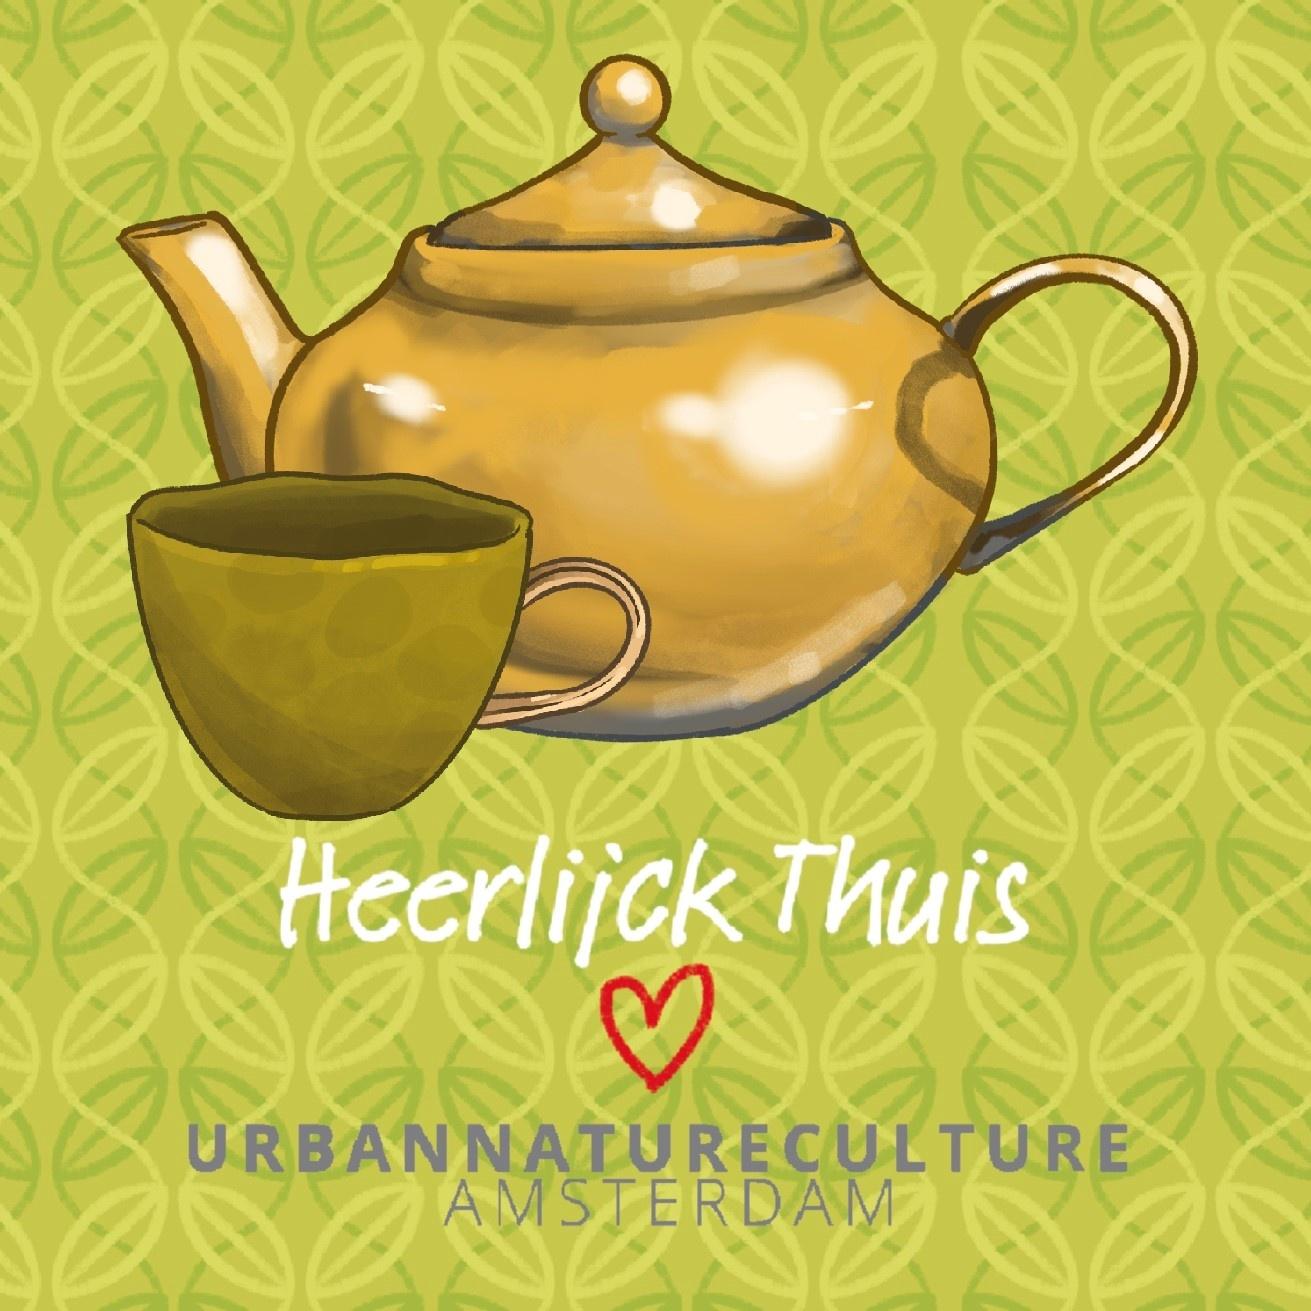 Heerlijck Thuis ❤️ Urban Nature Culture